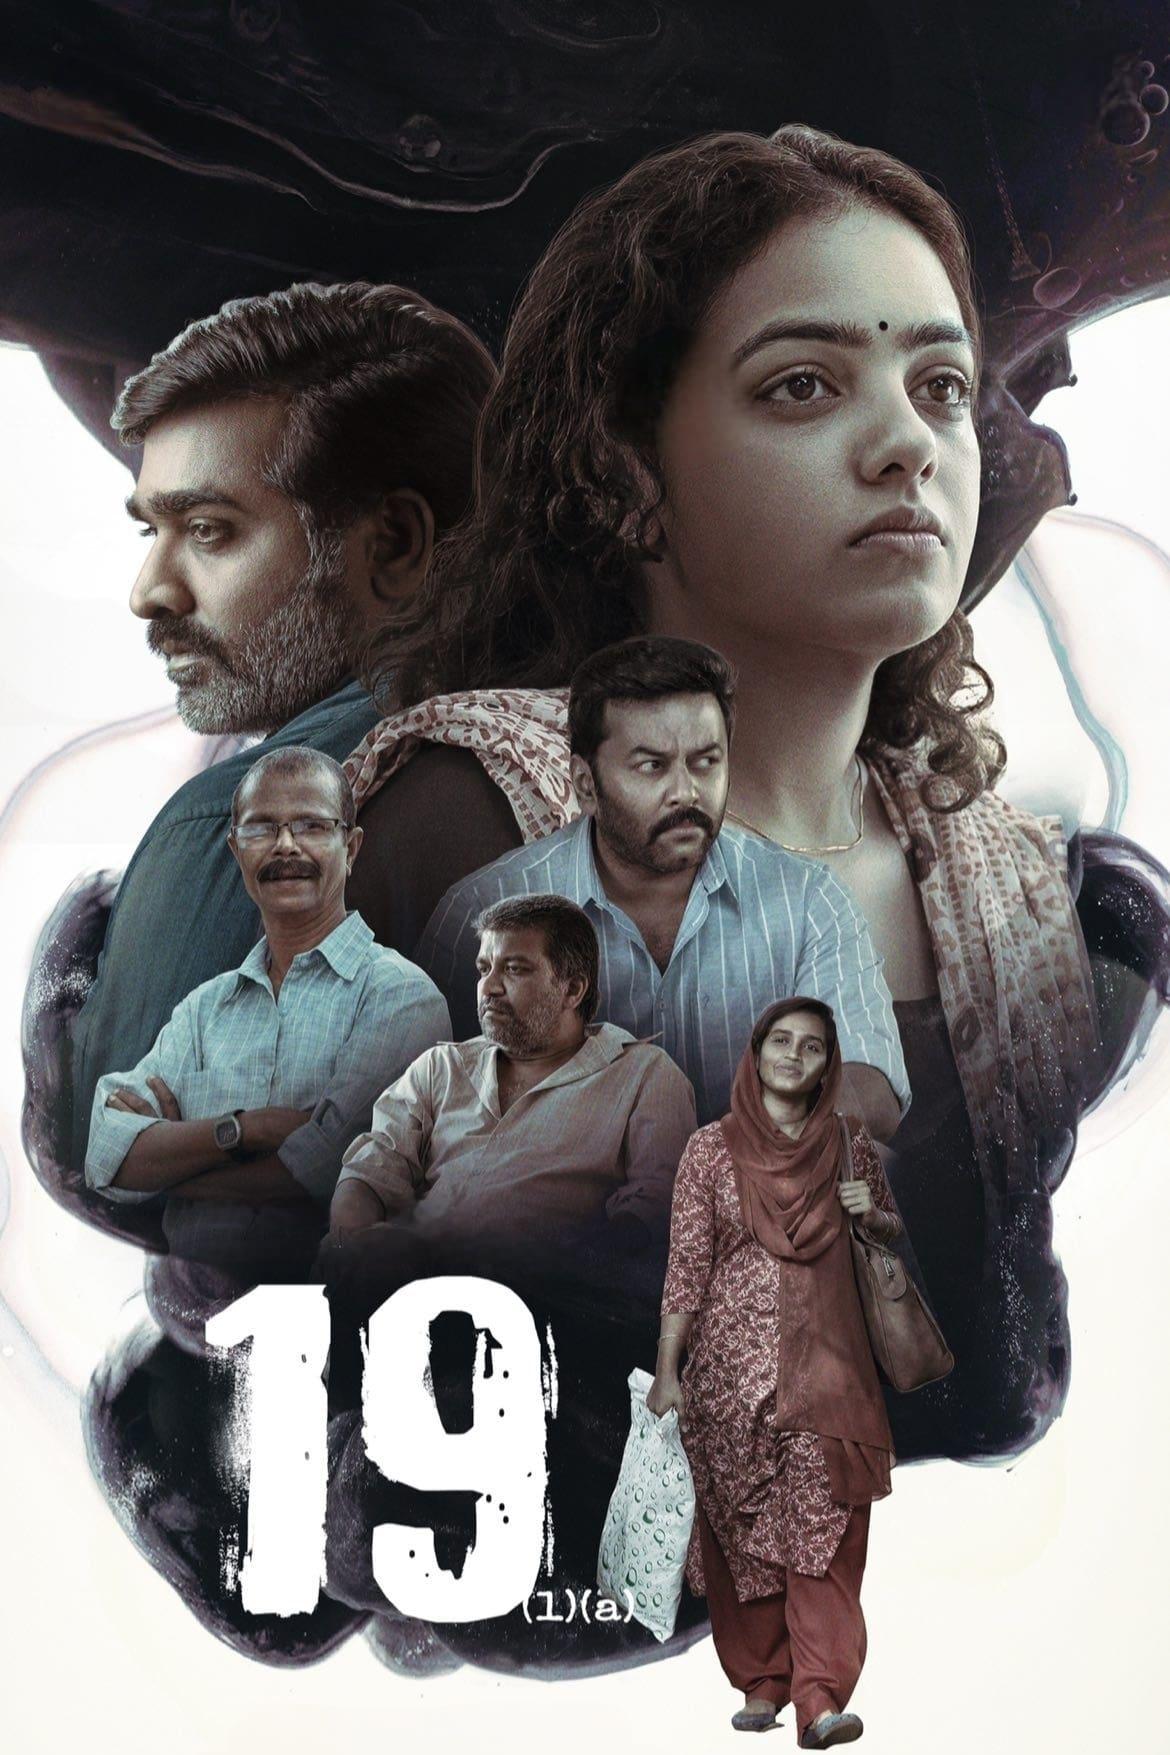 19 (1) (a)